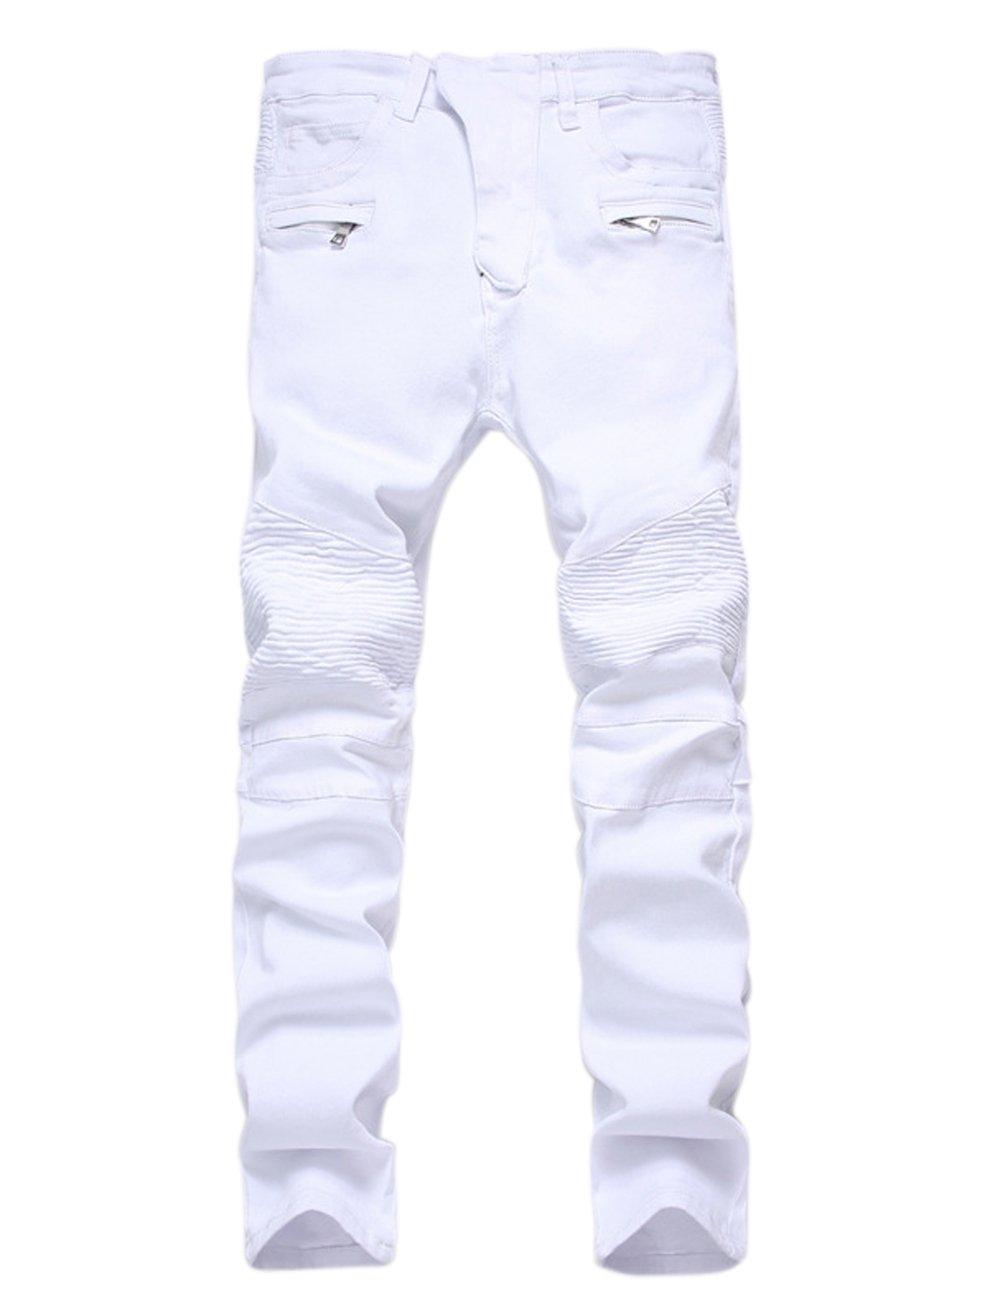 Wenseny Men's Wrinkled Ripped Moto Biker Jeans Zipper Pocket Slim Fit Washed Skinny Pants White W32